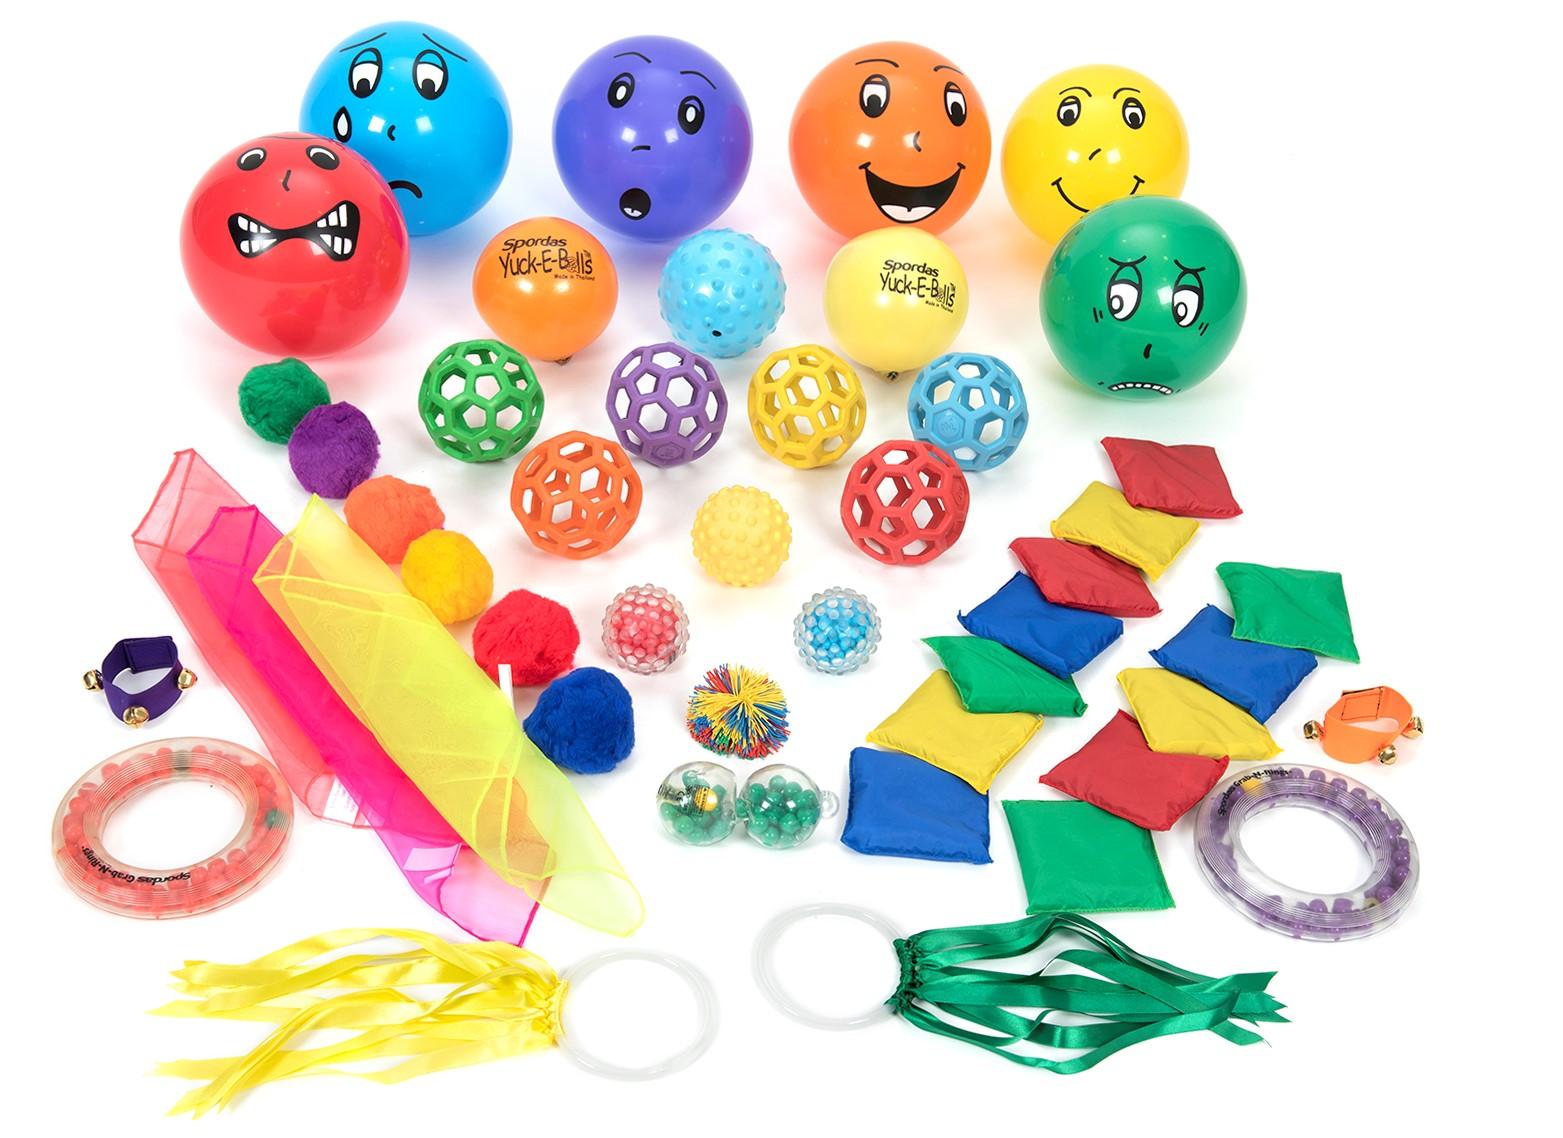 Sensory Play Kit